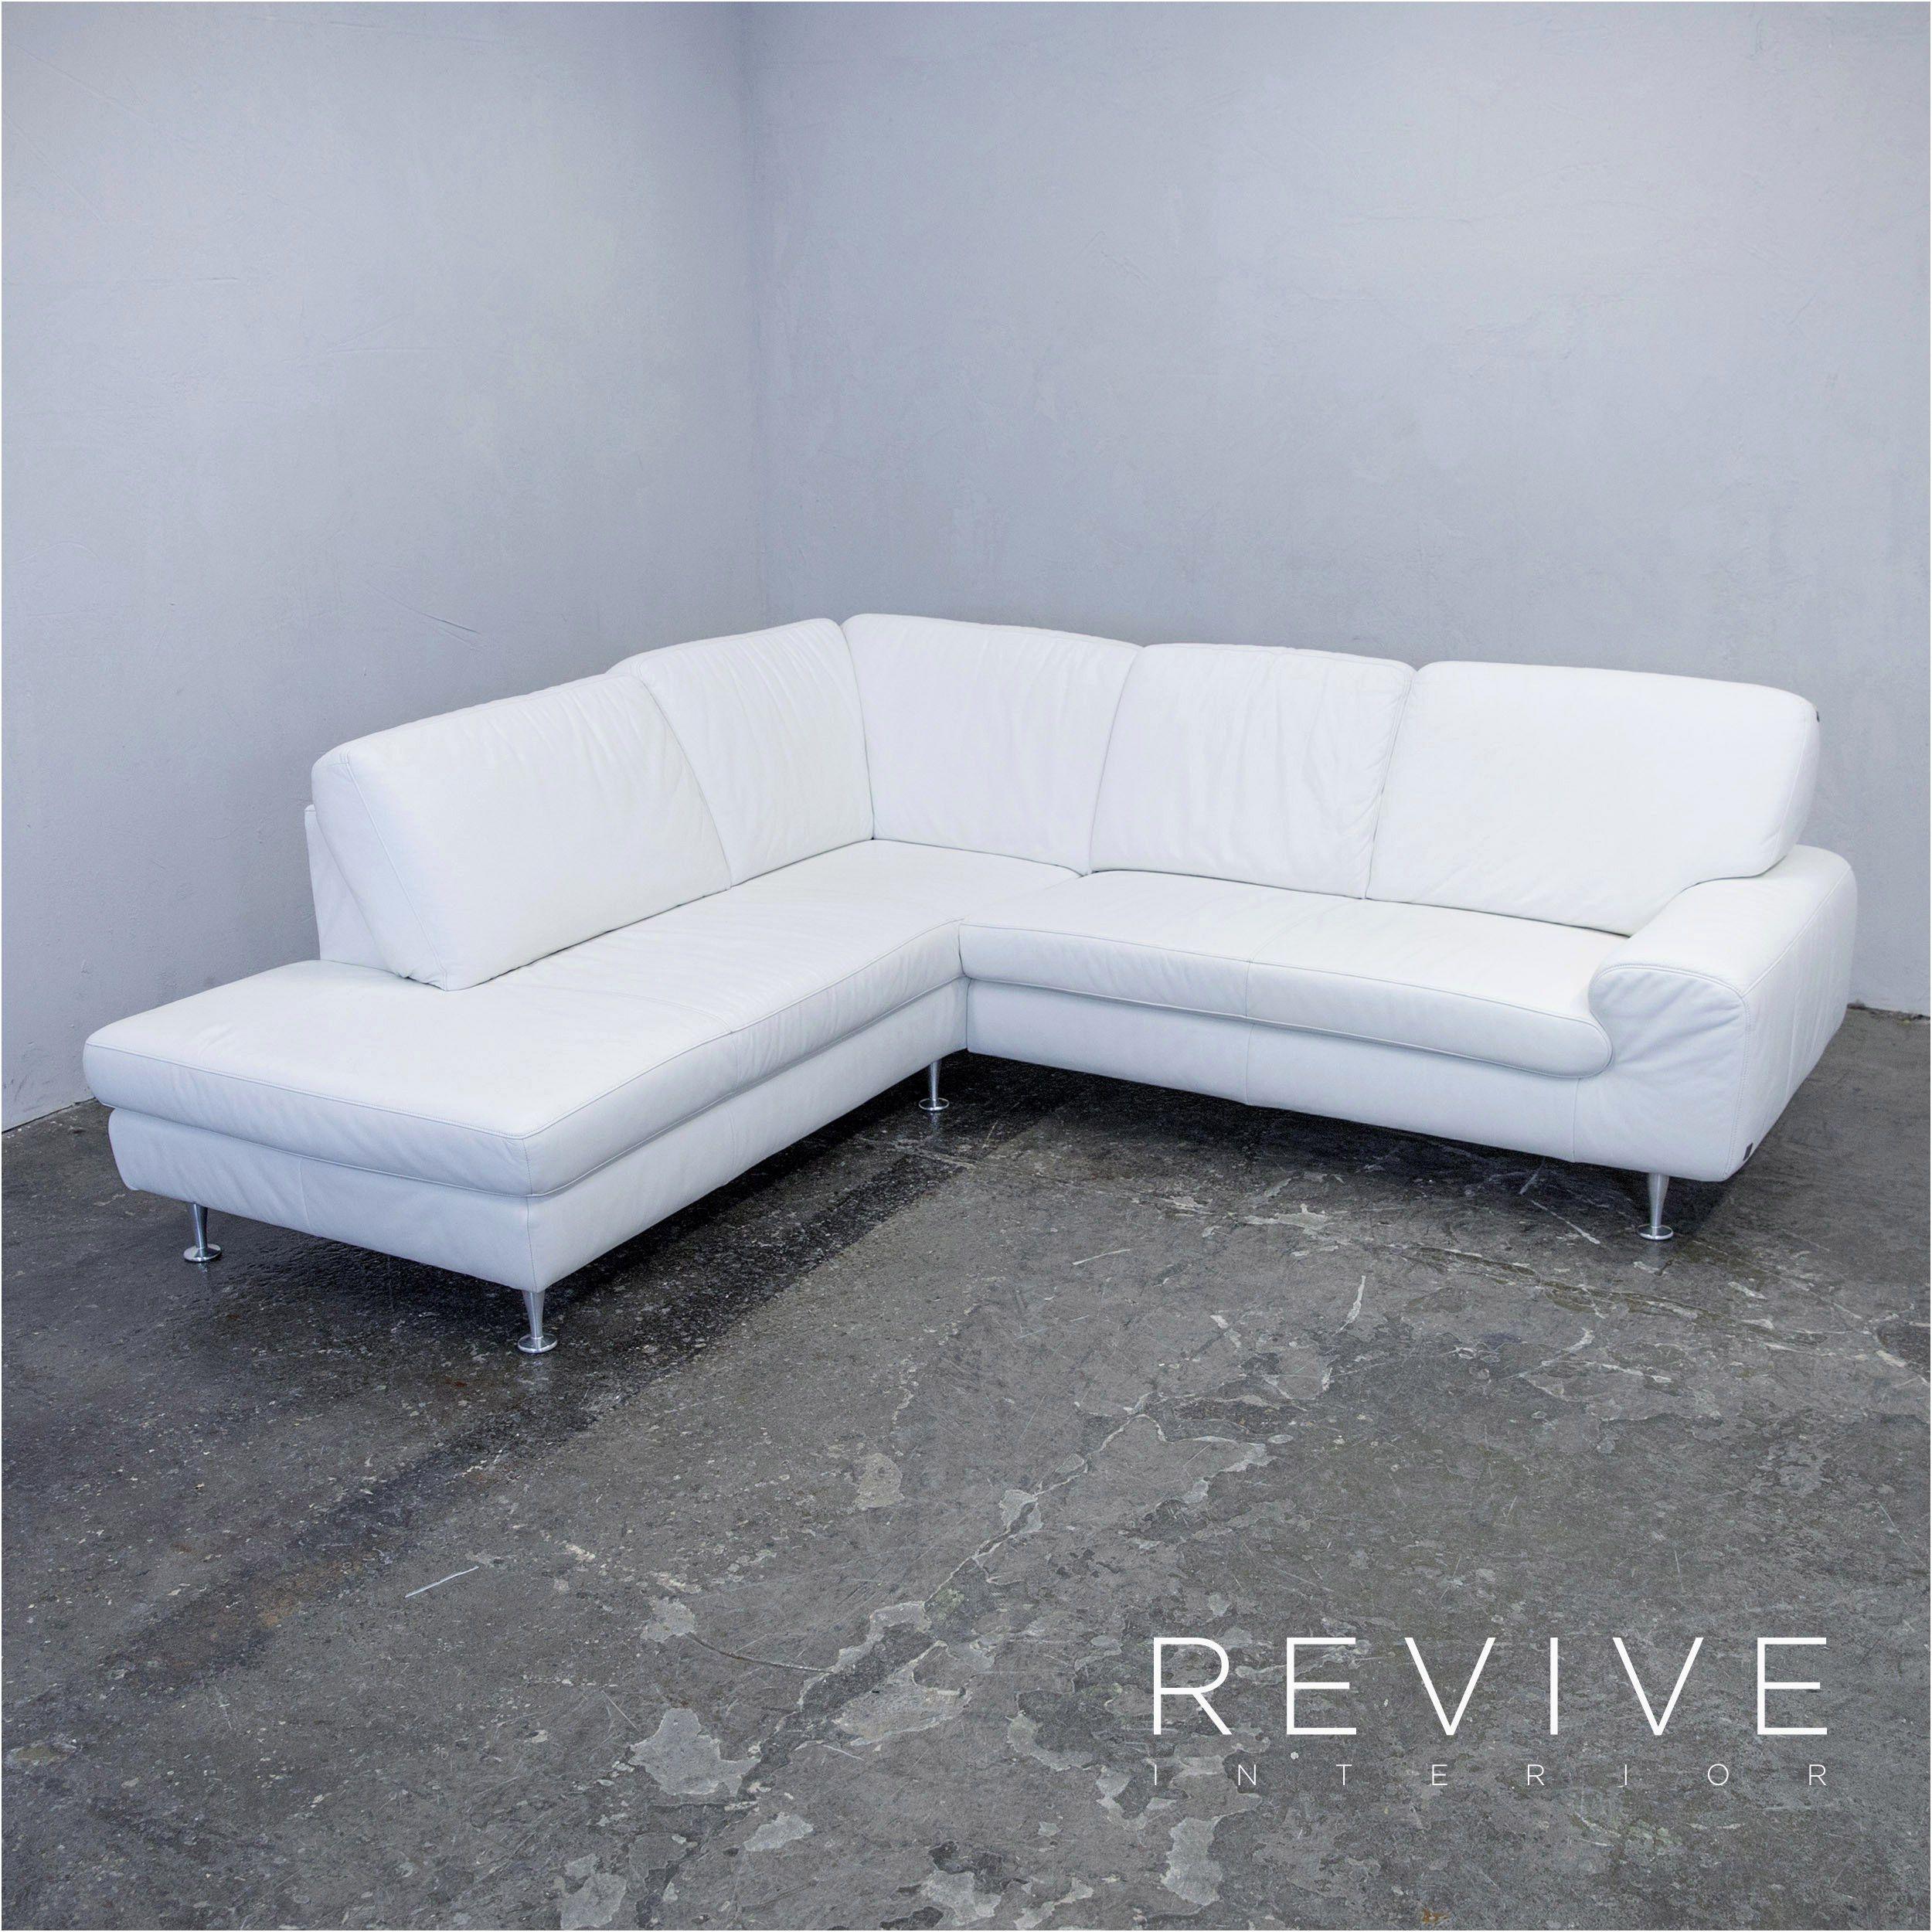 Majestatisch Ecksofa Grau Weiss Sectional Couch Decor Couch